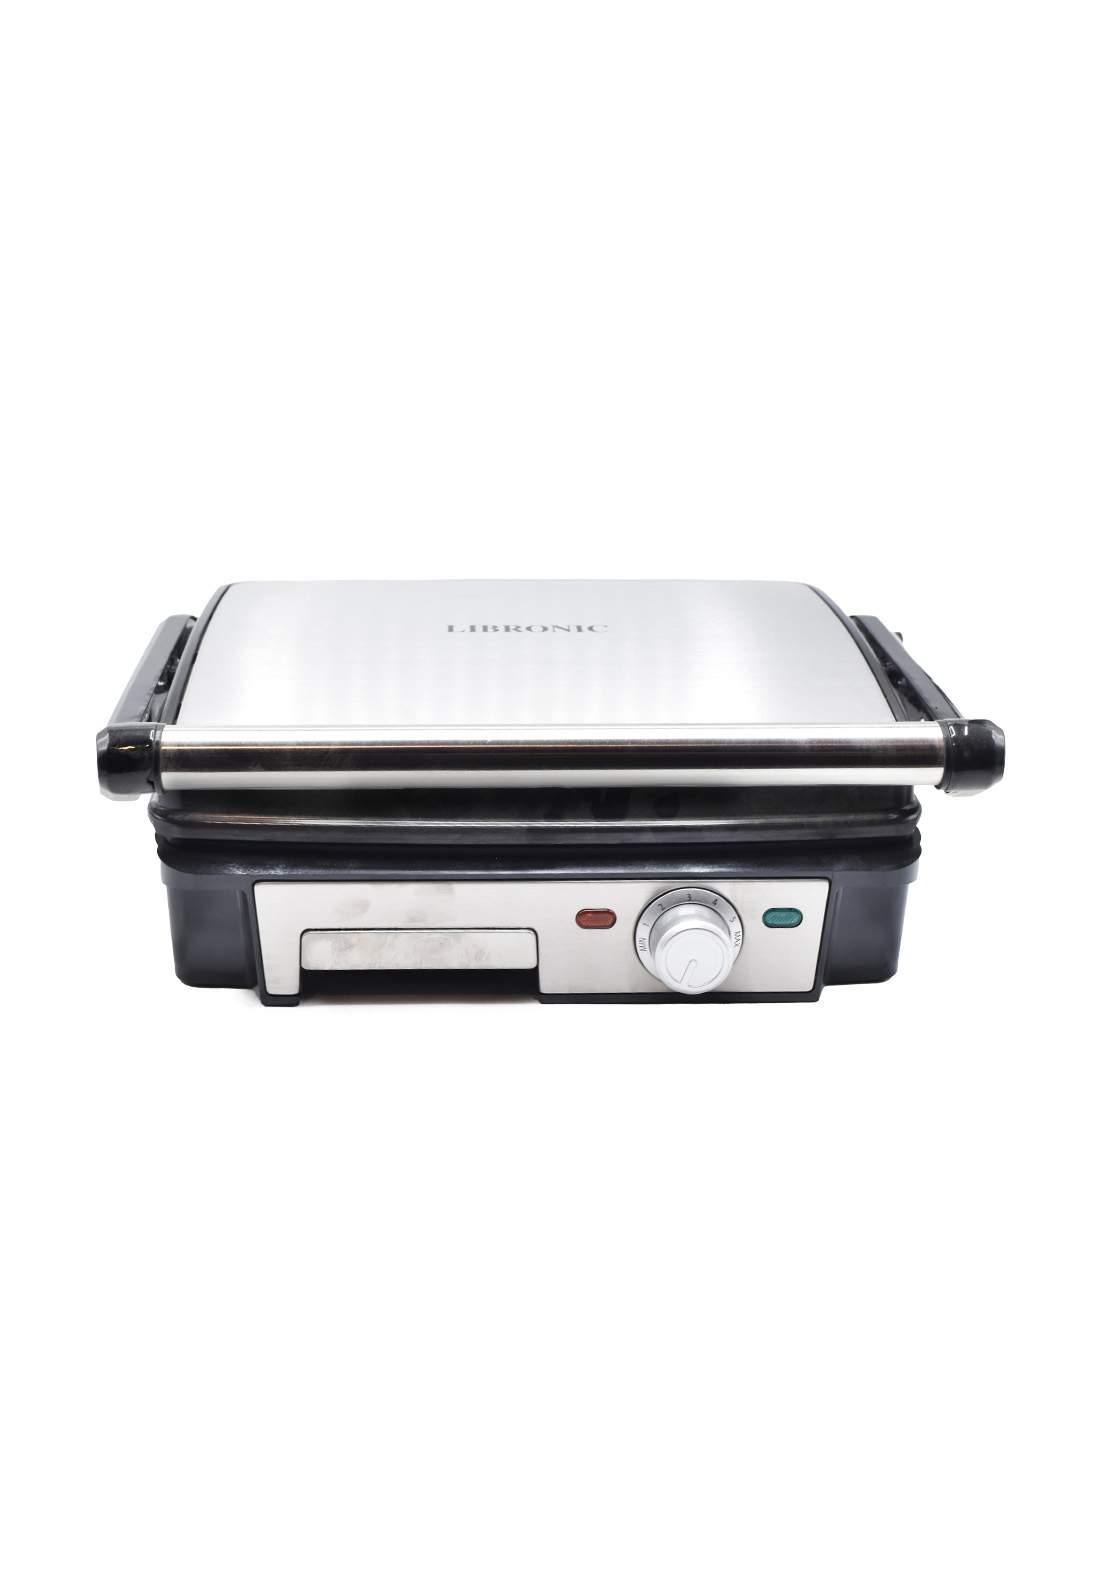 Libronic HG-8004 Sandwich Maker كابسة ومحمصة للاطعمة